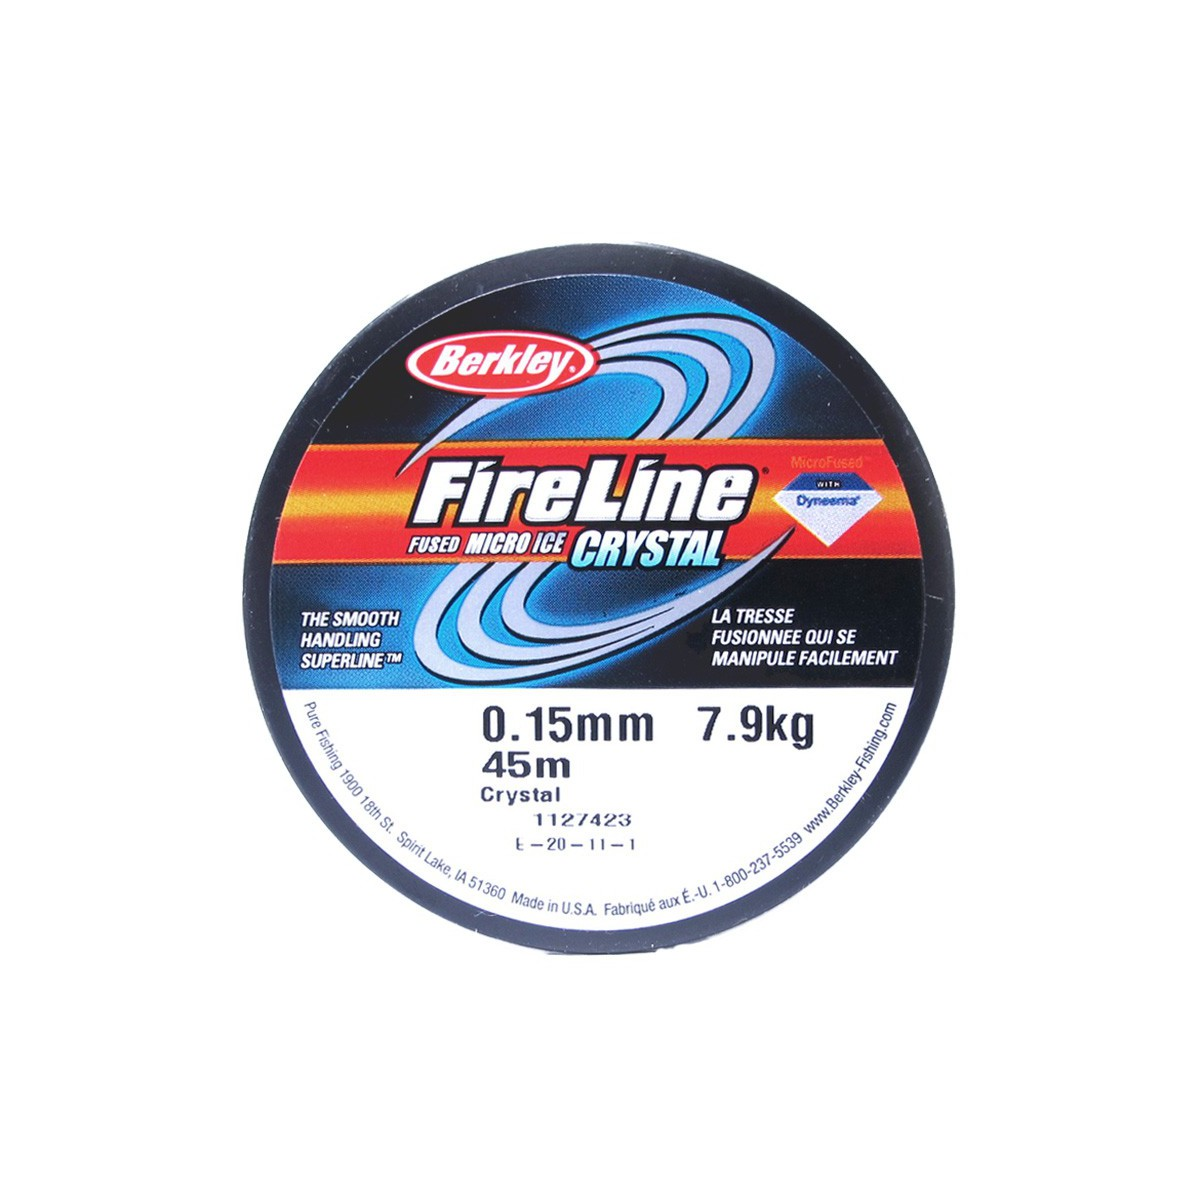 Fireline Crystal 0.15MM 46 Mt